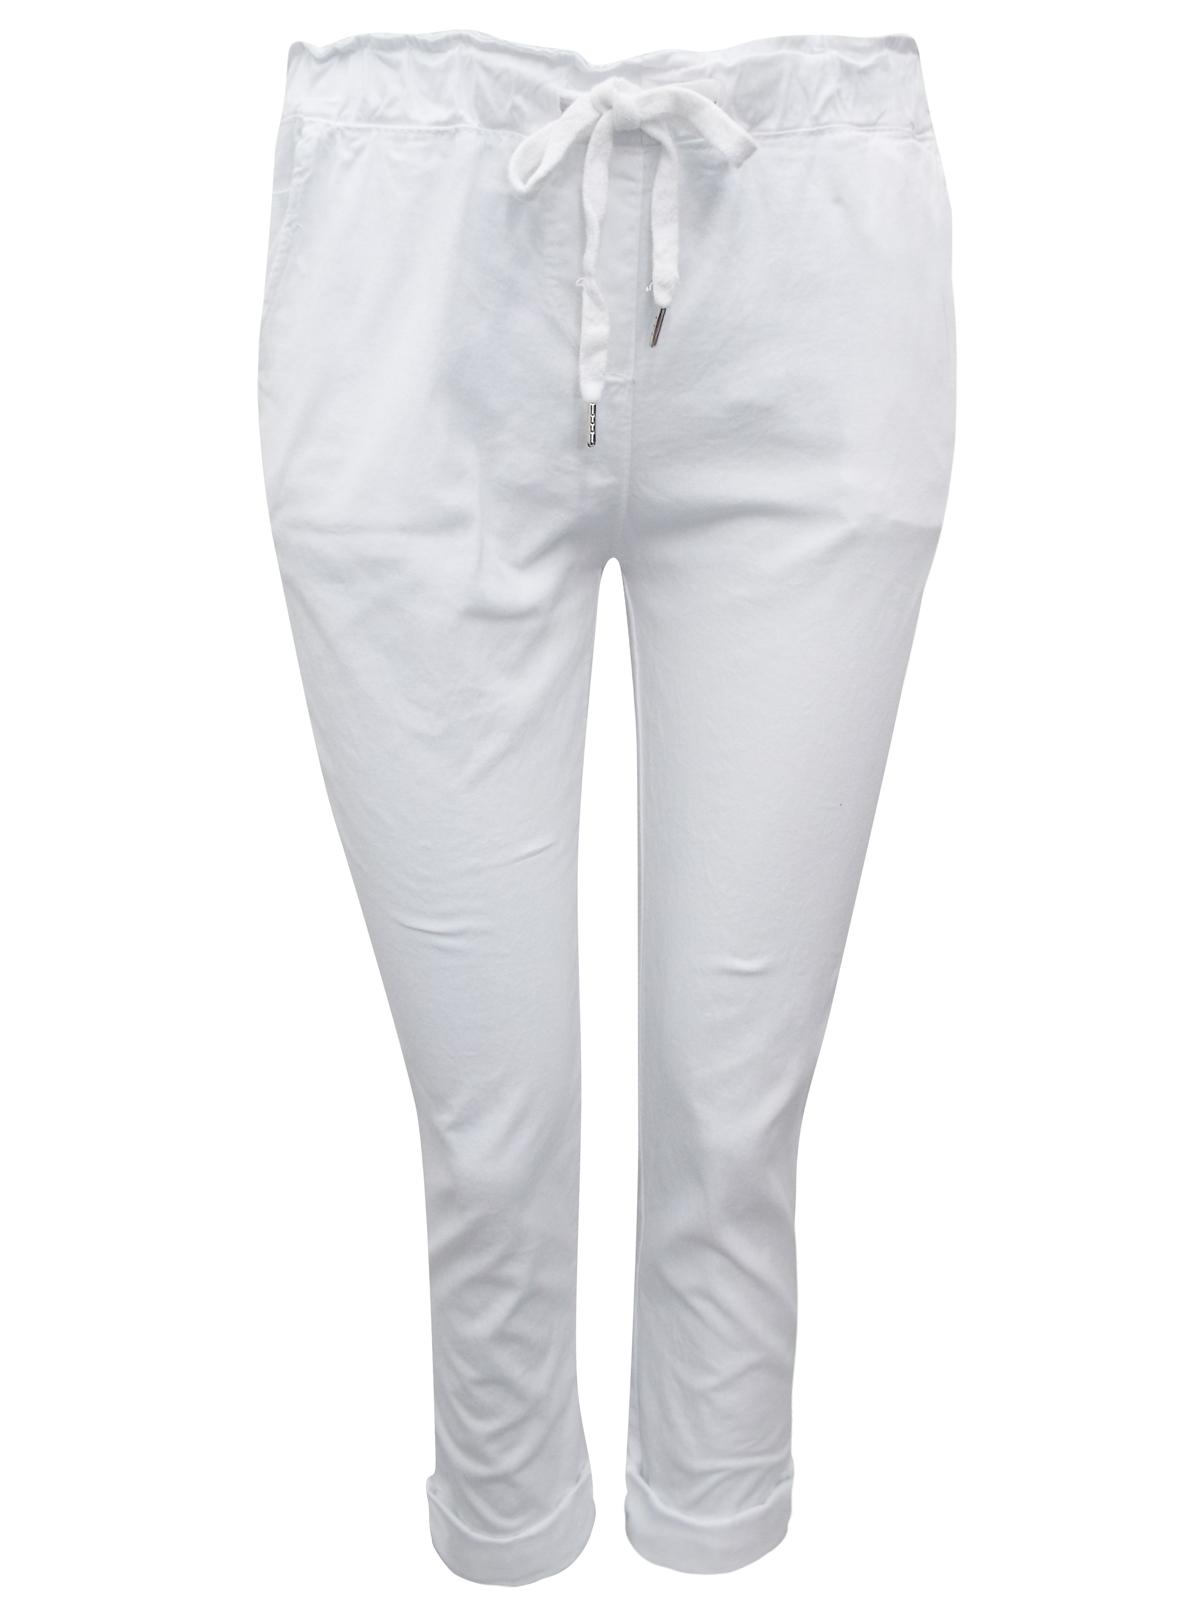 Vivi Pronto Moda Vivi Pronto Moda White Pull On